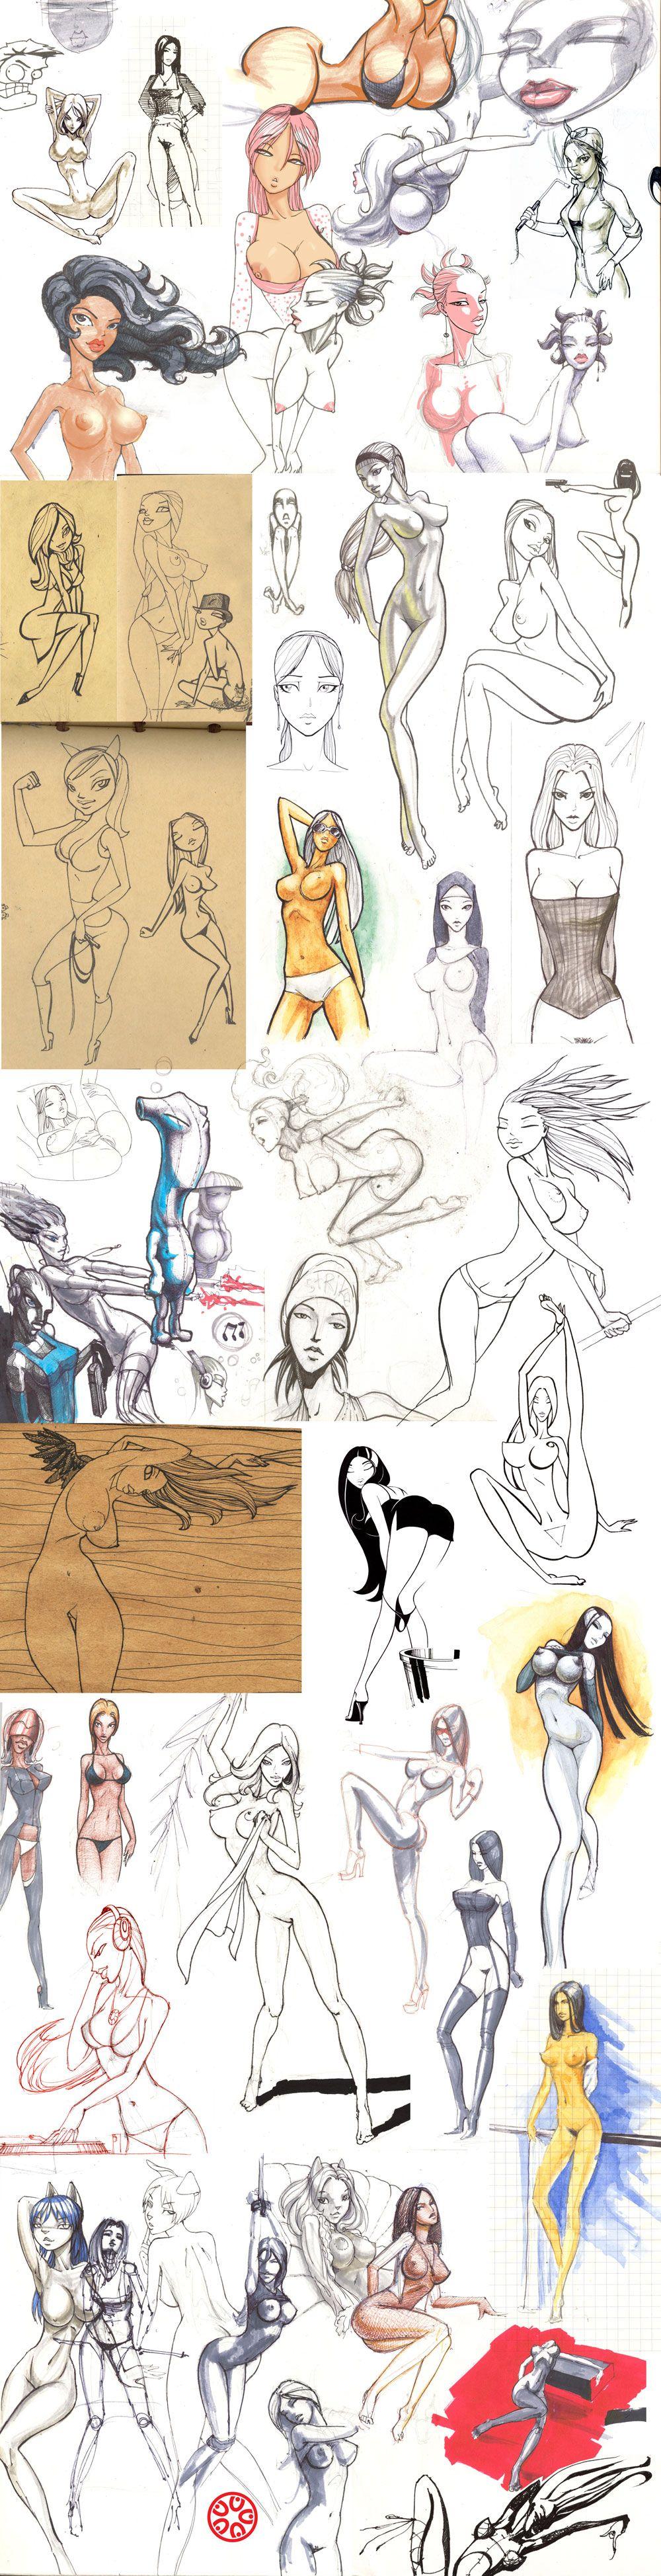 sketches | Drawing | Pinterest | Dibujo, Anatomía y Dibujar